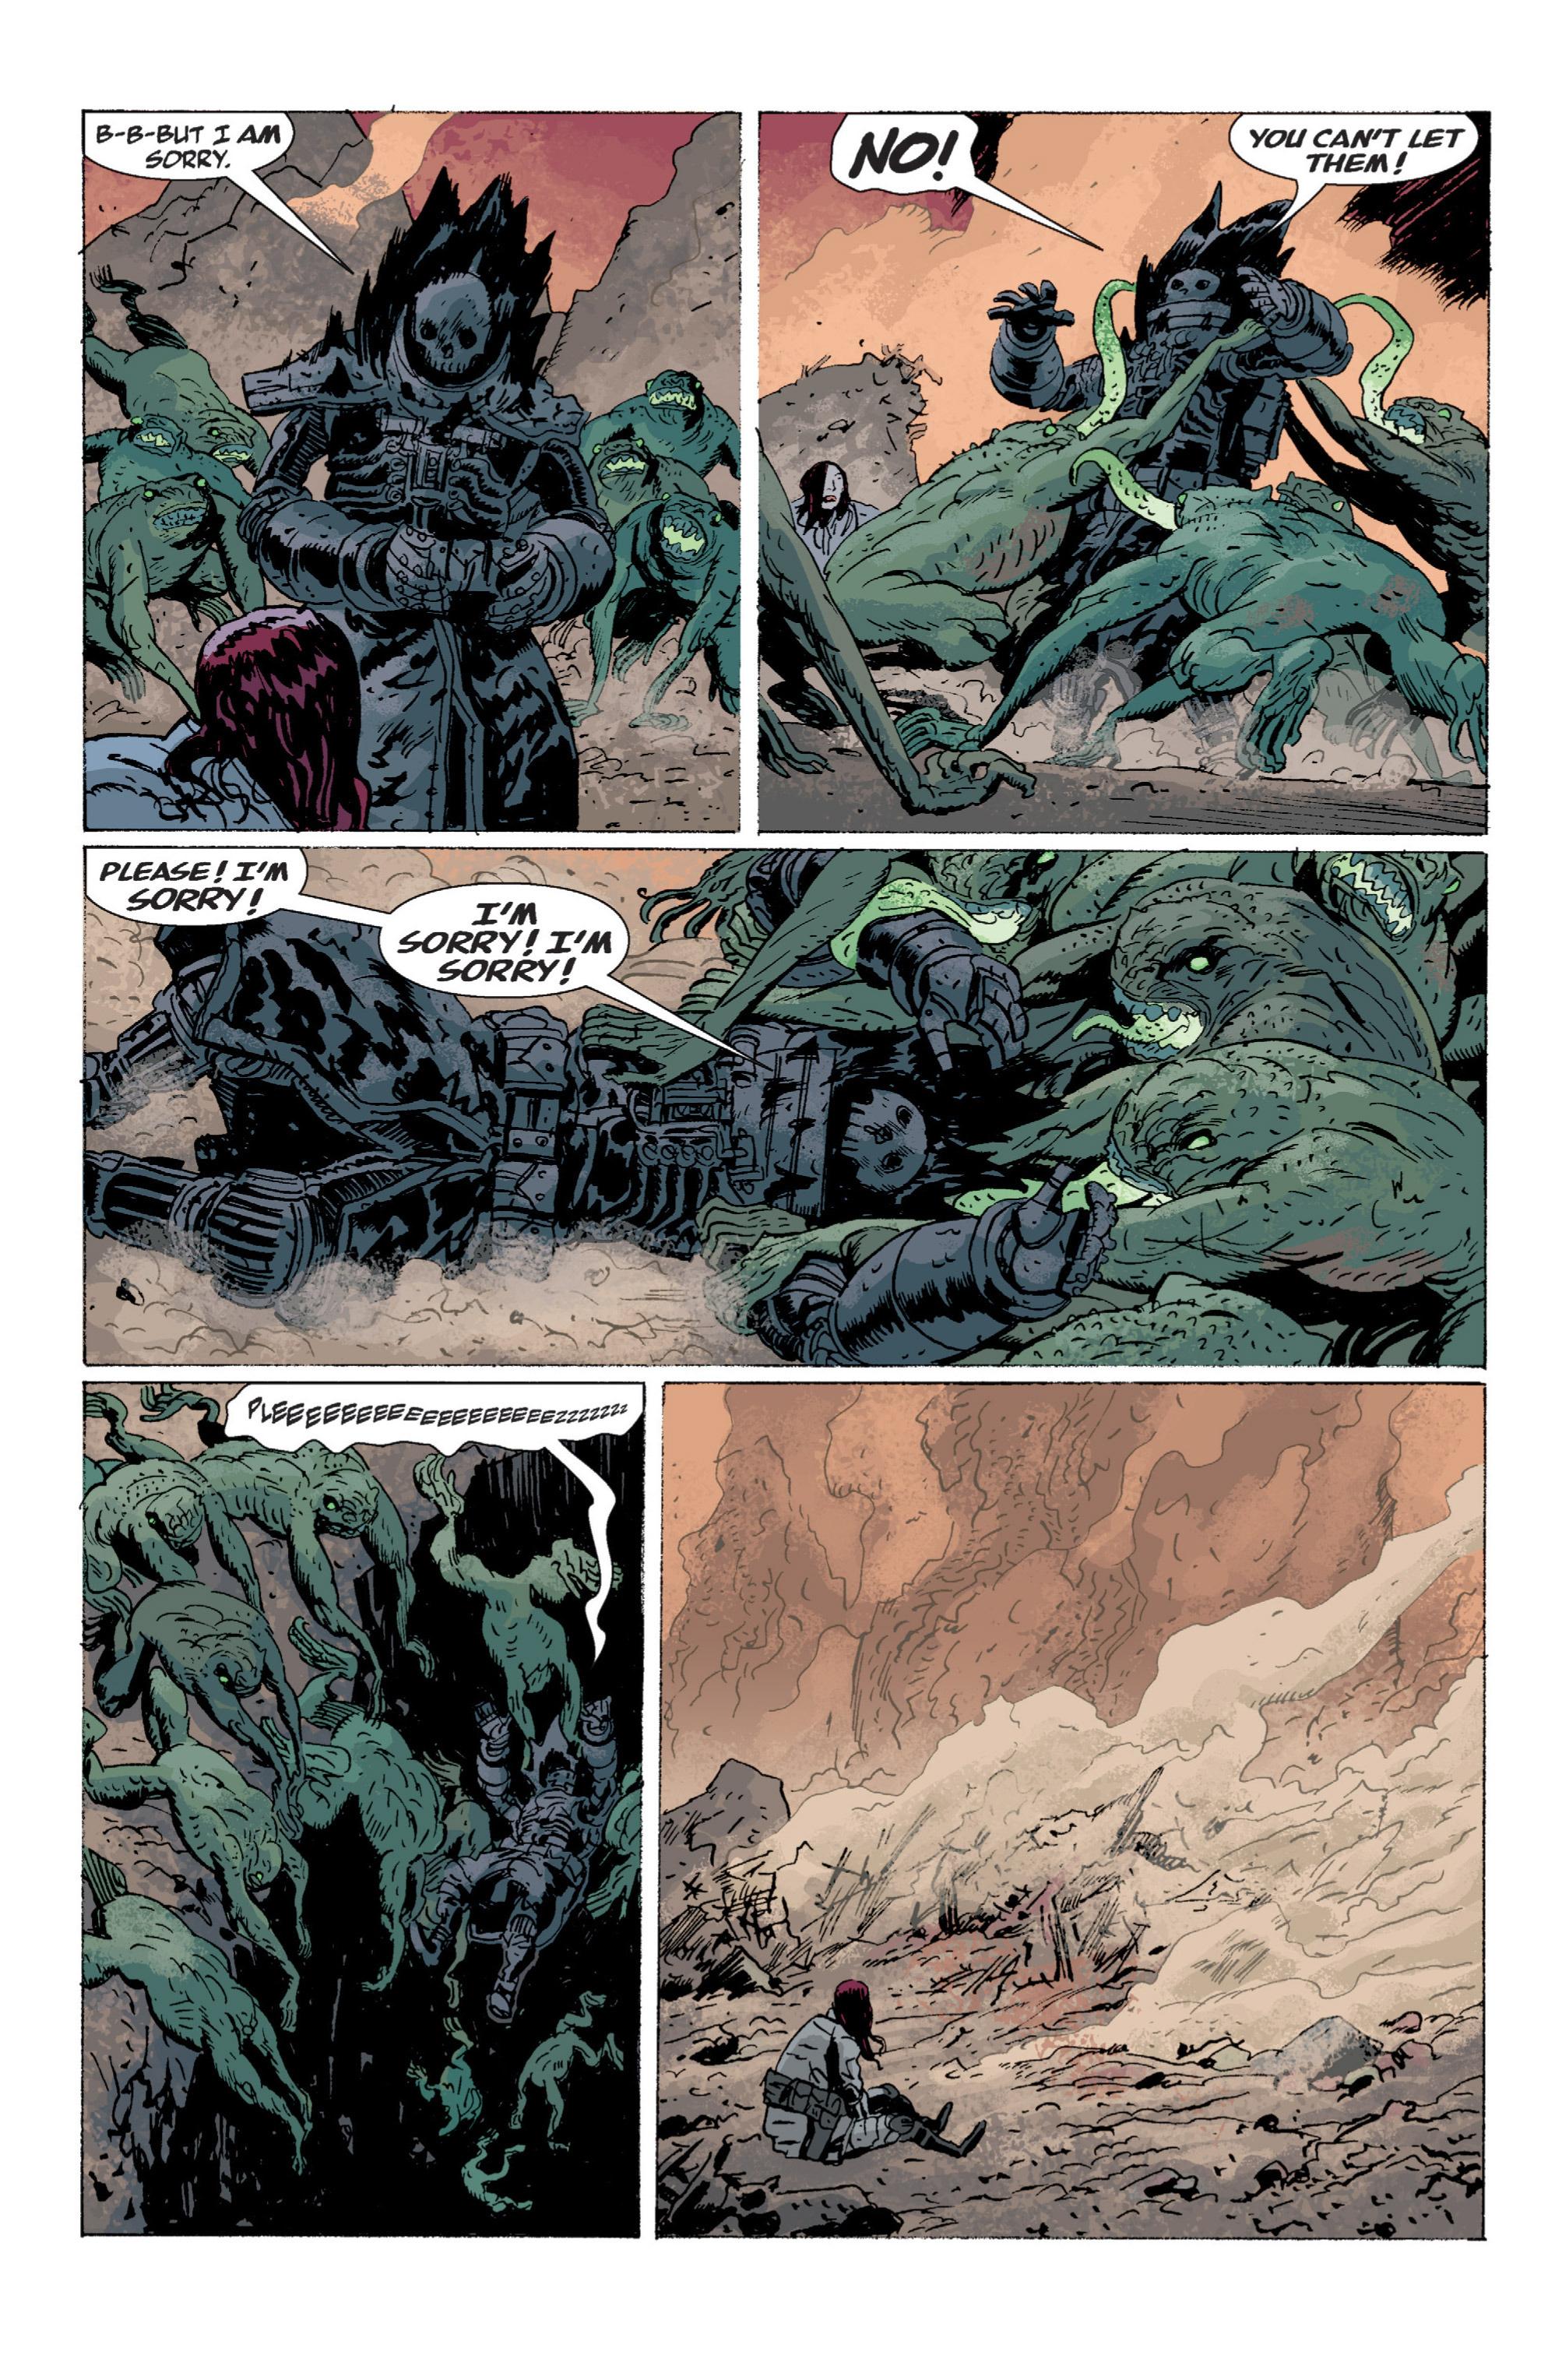 Read online B.P.R.D. (2003) comic -  Issue # TPB 5 - 154